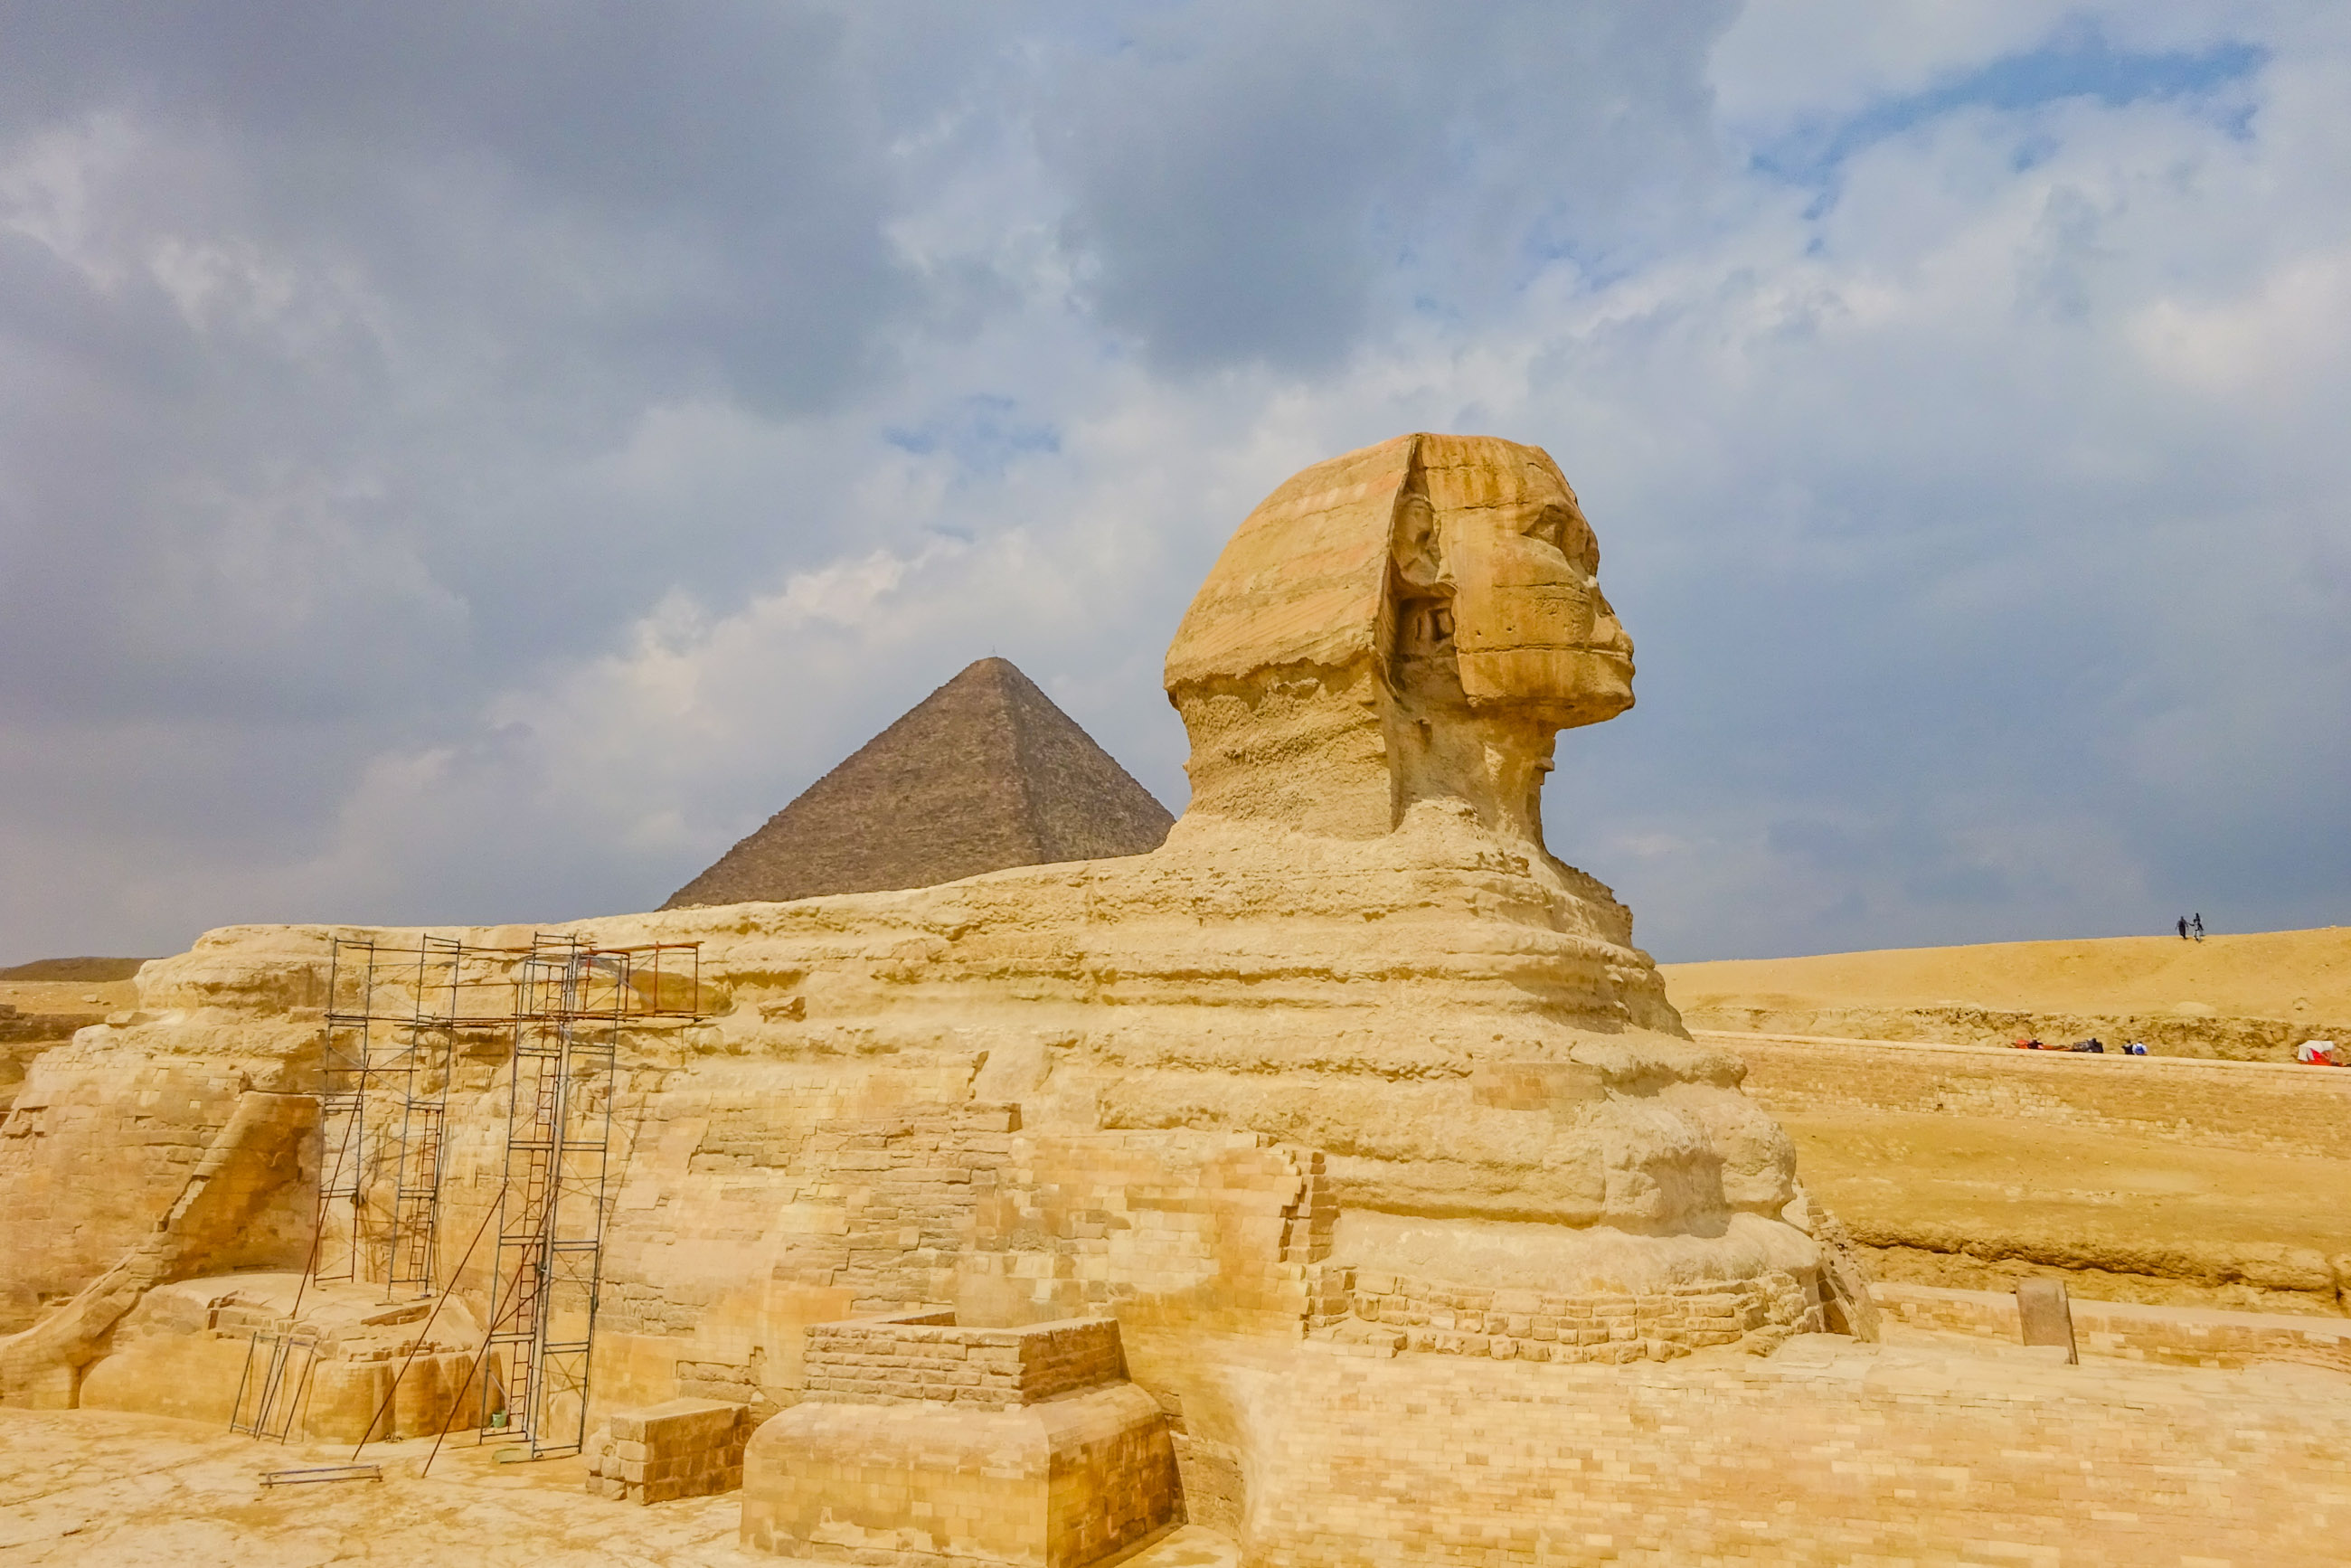 https://bubo.sk/uploads/galleries/18745/miroslavadlha_egypt_kahira-58-.jpg